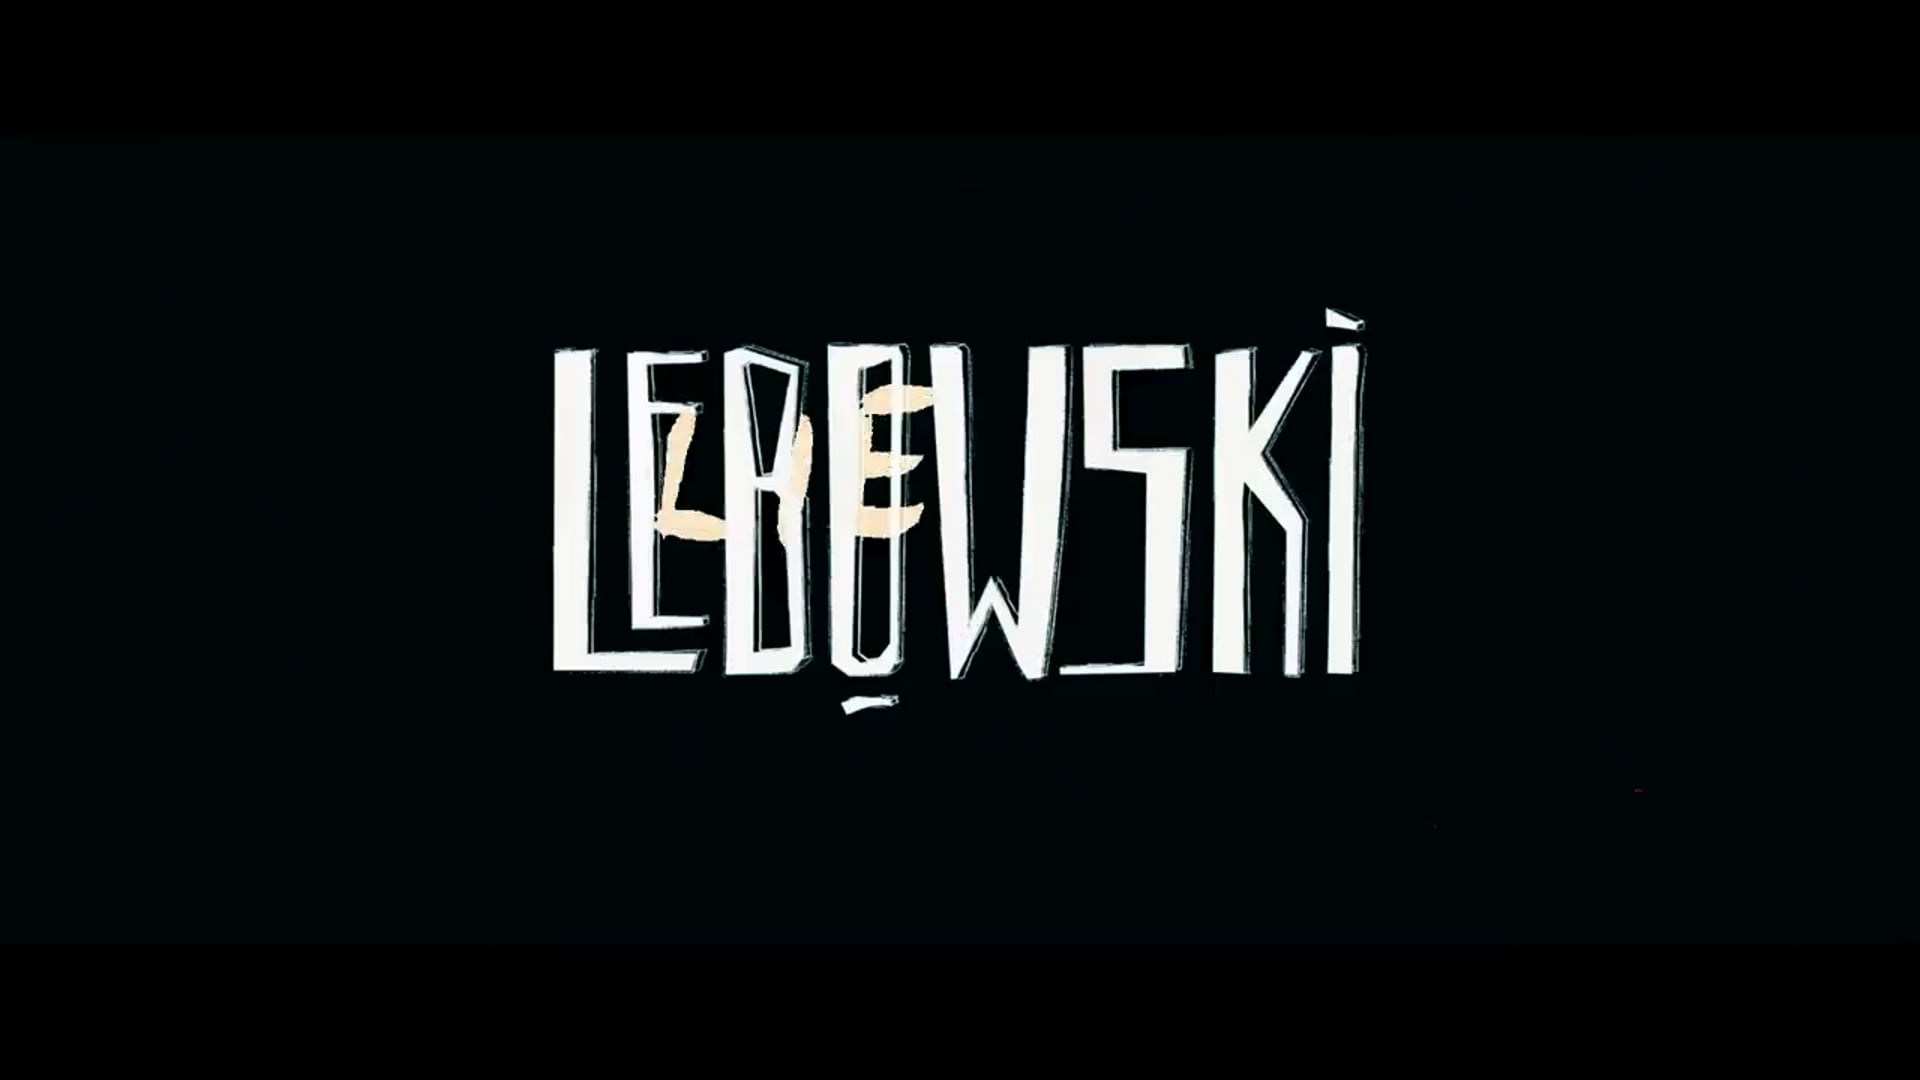 #LBWSK